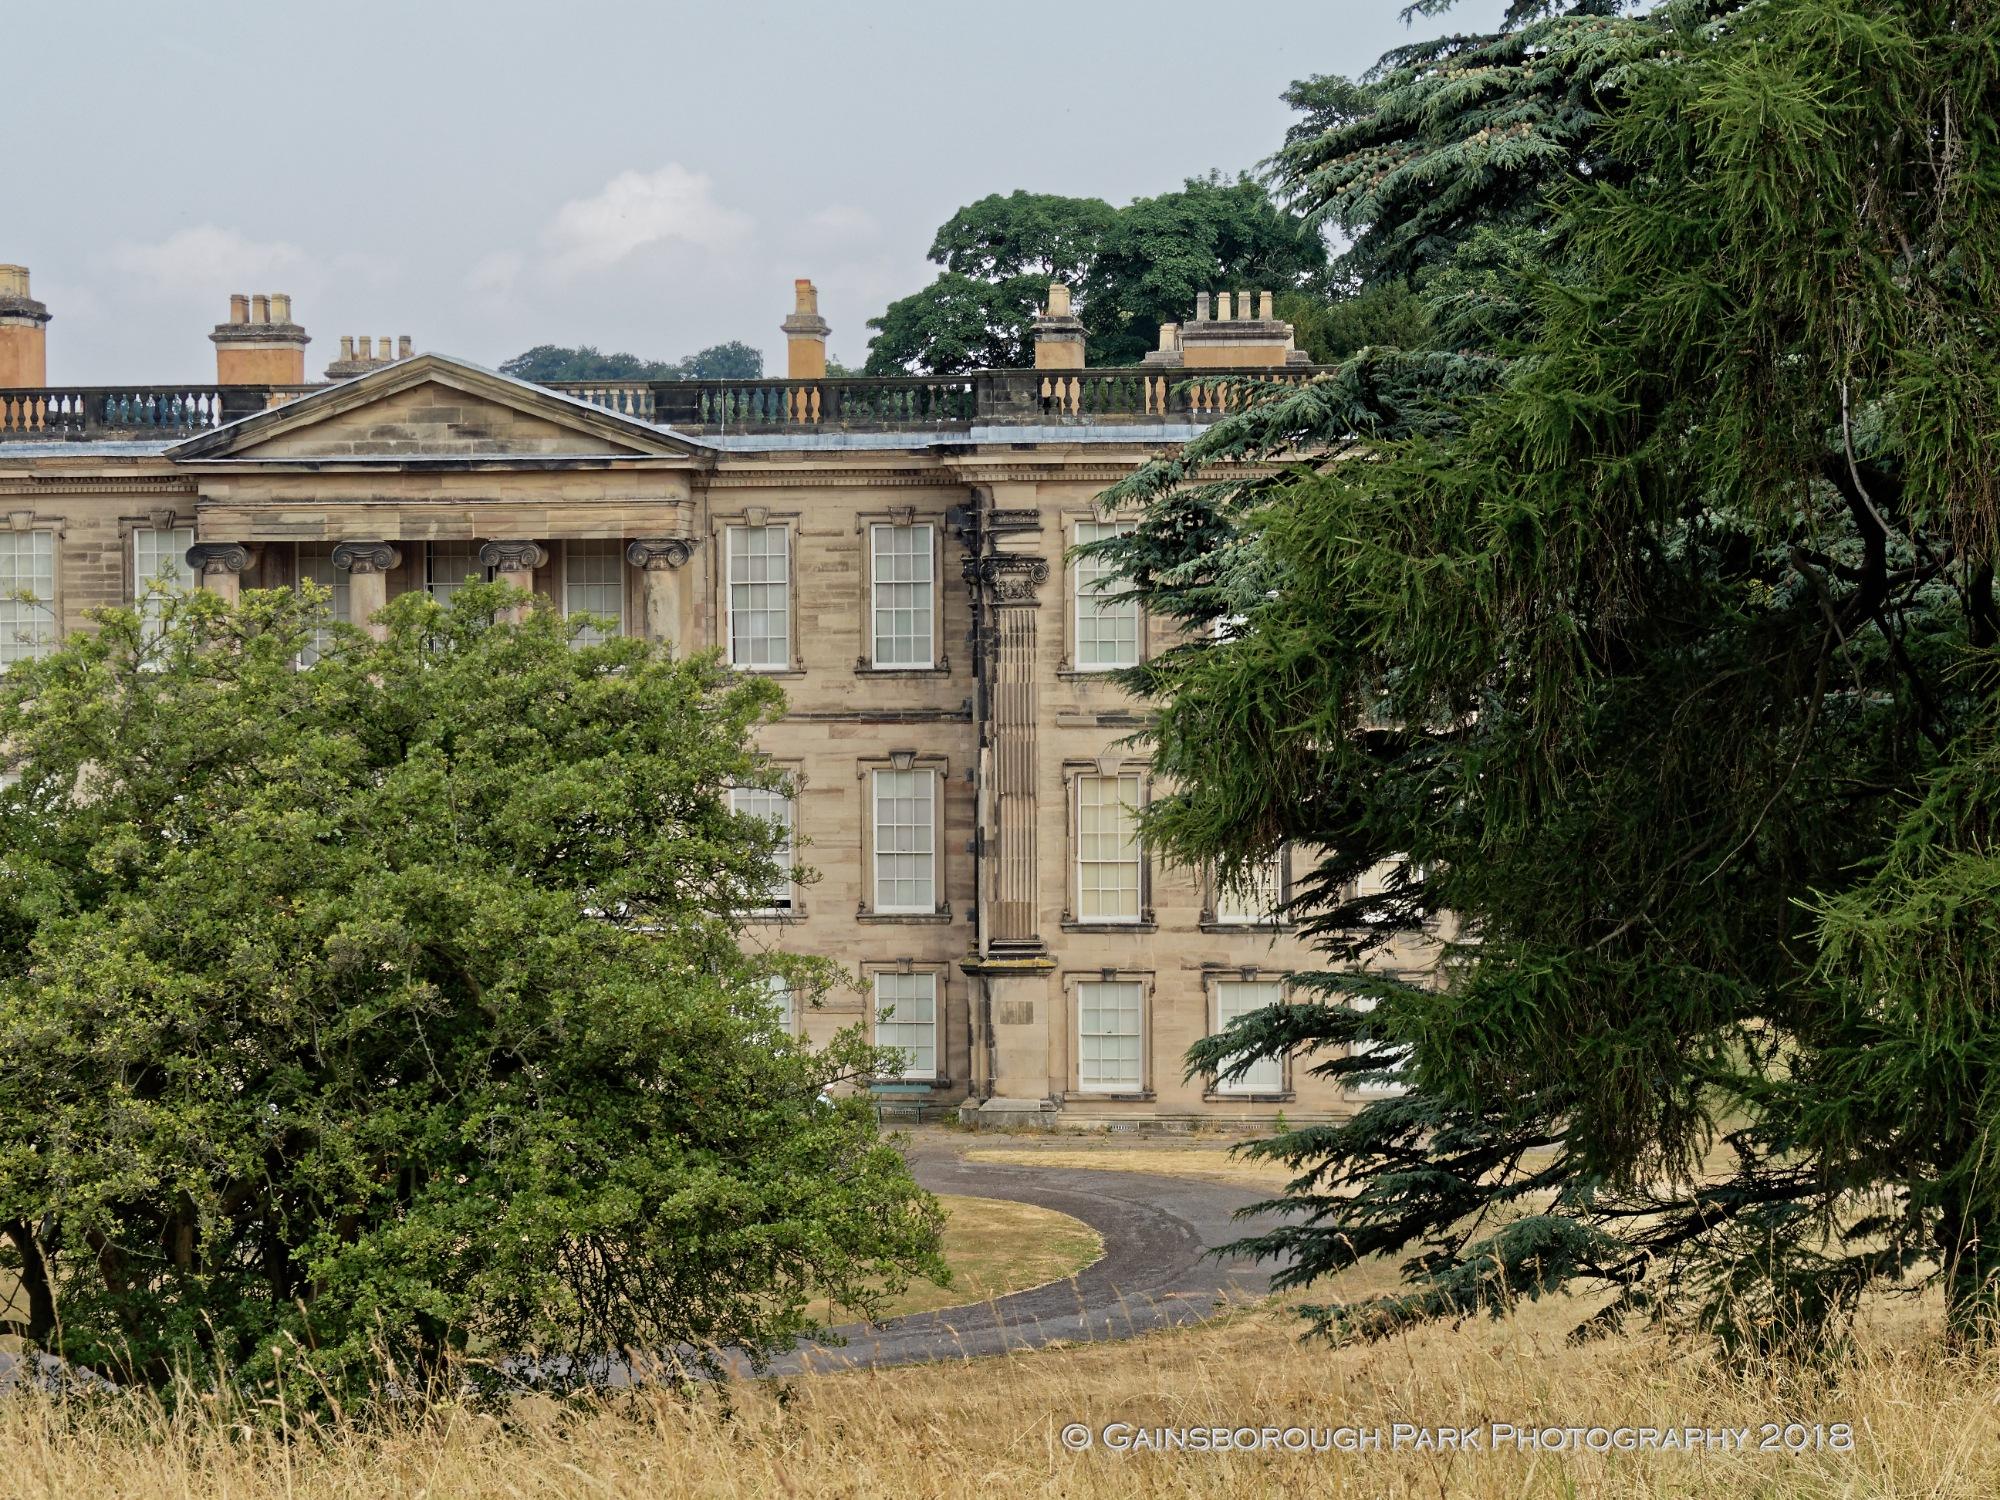 Calke Abbey by Gainsborough Park Photography